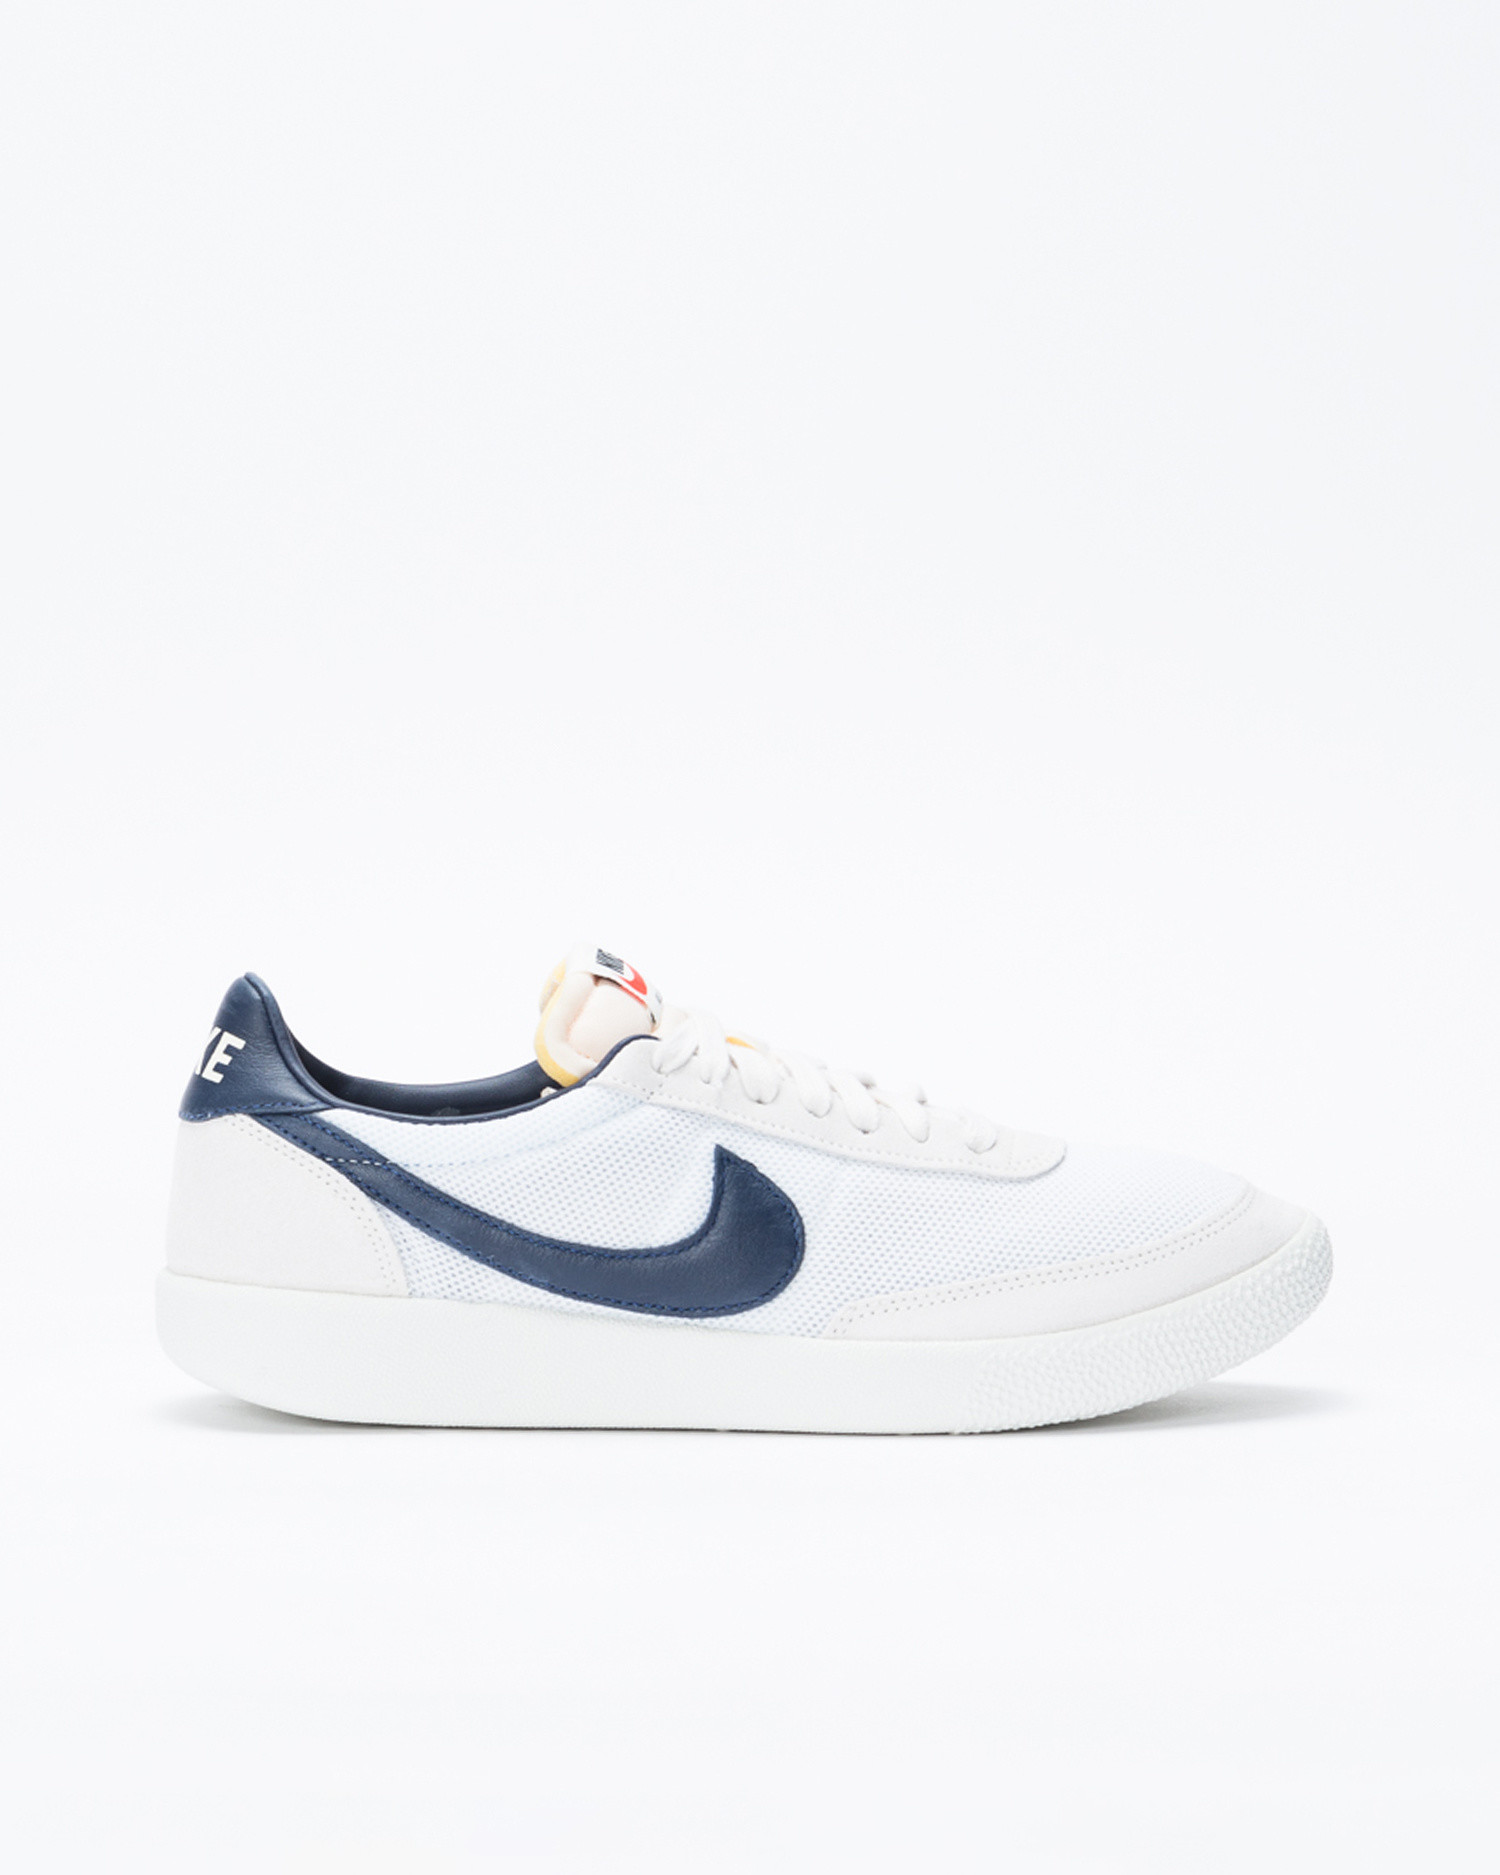 Nike Killshot OG Sp sail/midnight navy